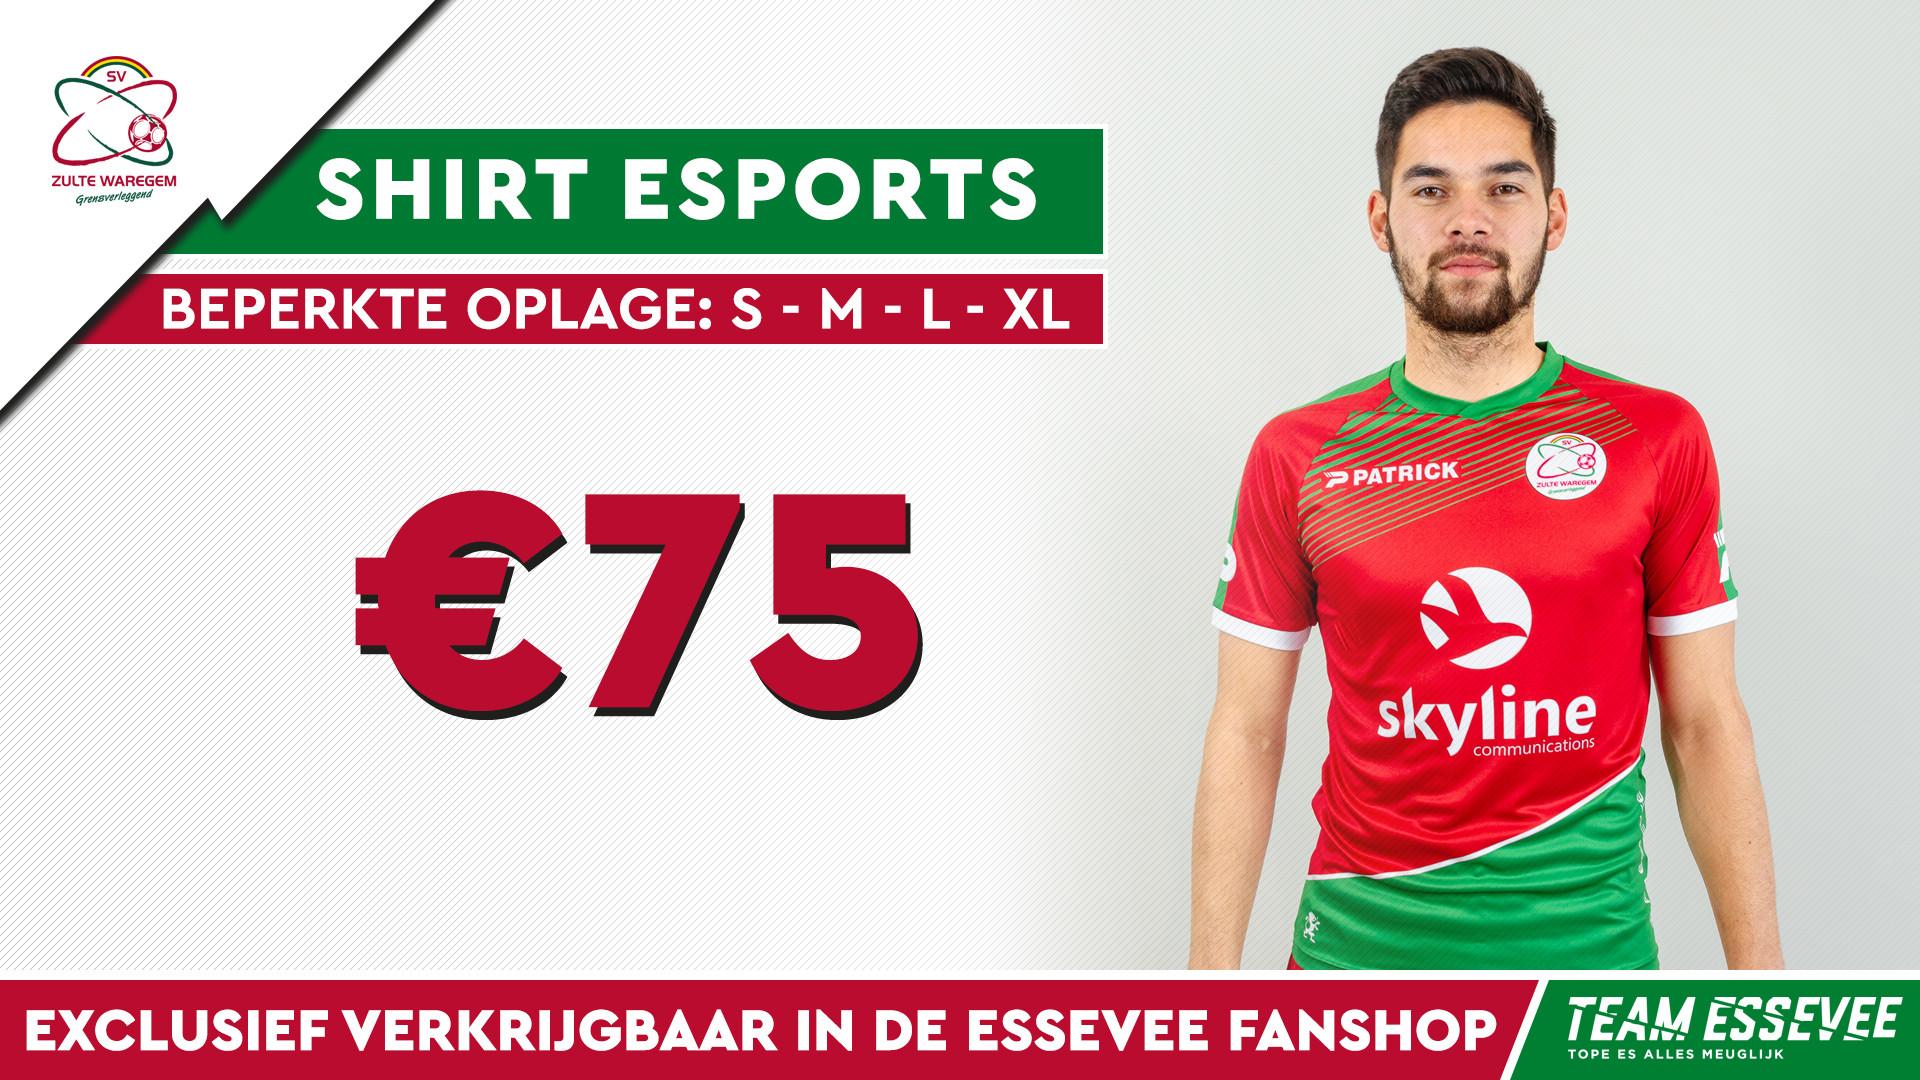 Shirt_eSports.jpg